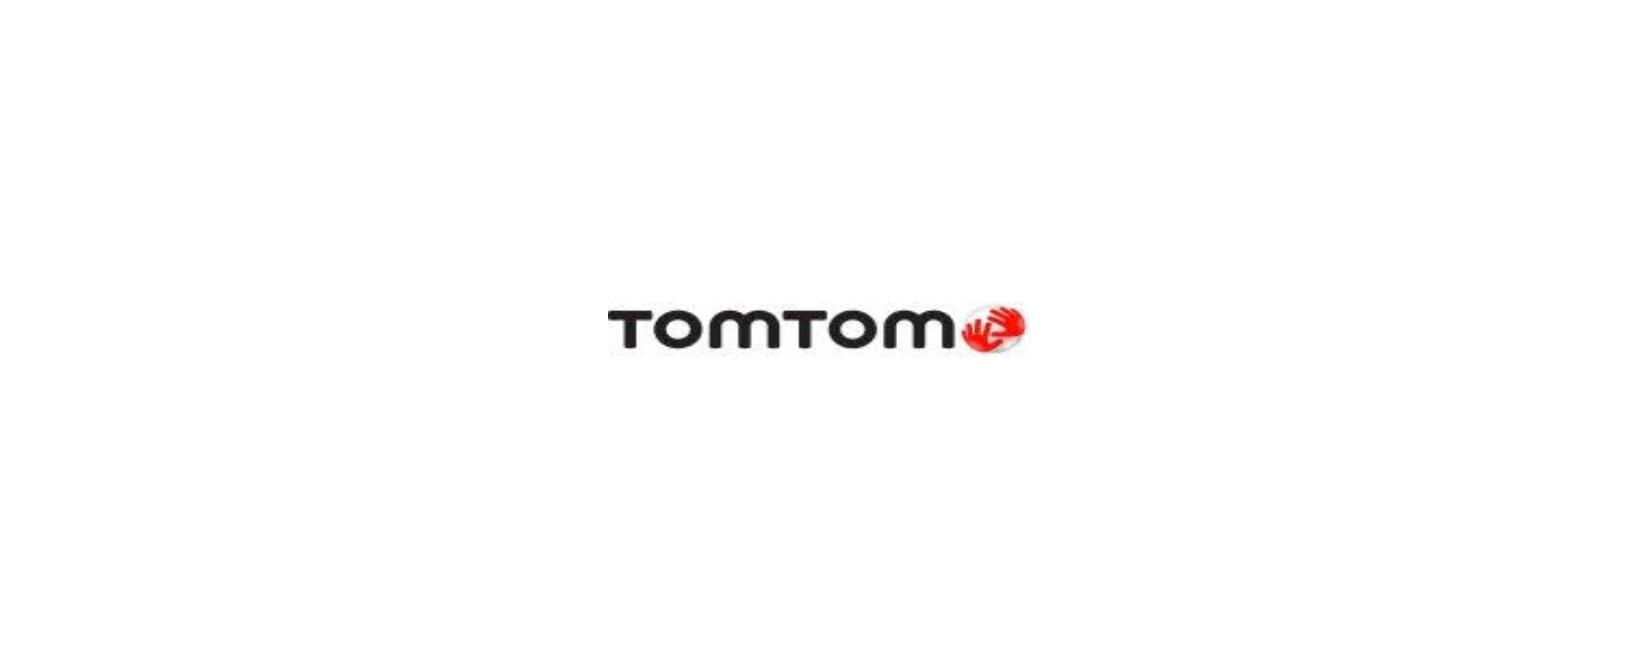 TomTom AU Discount Code 2021